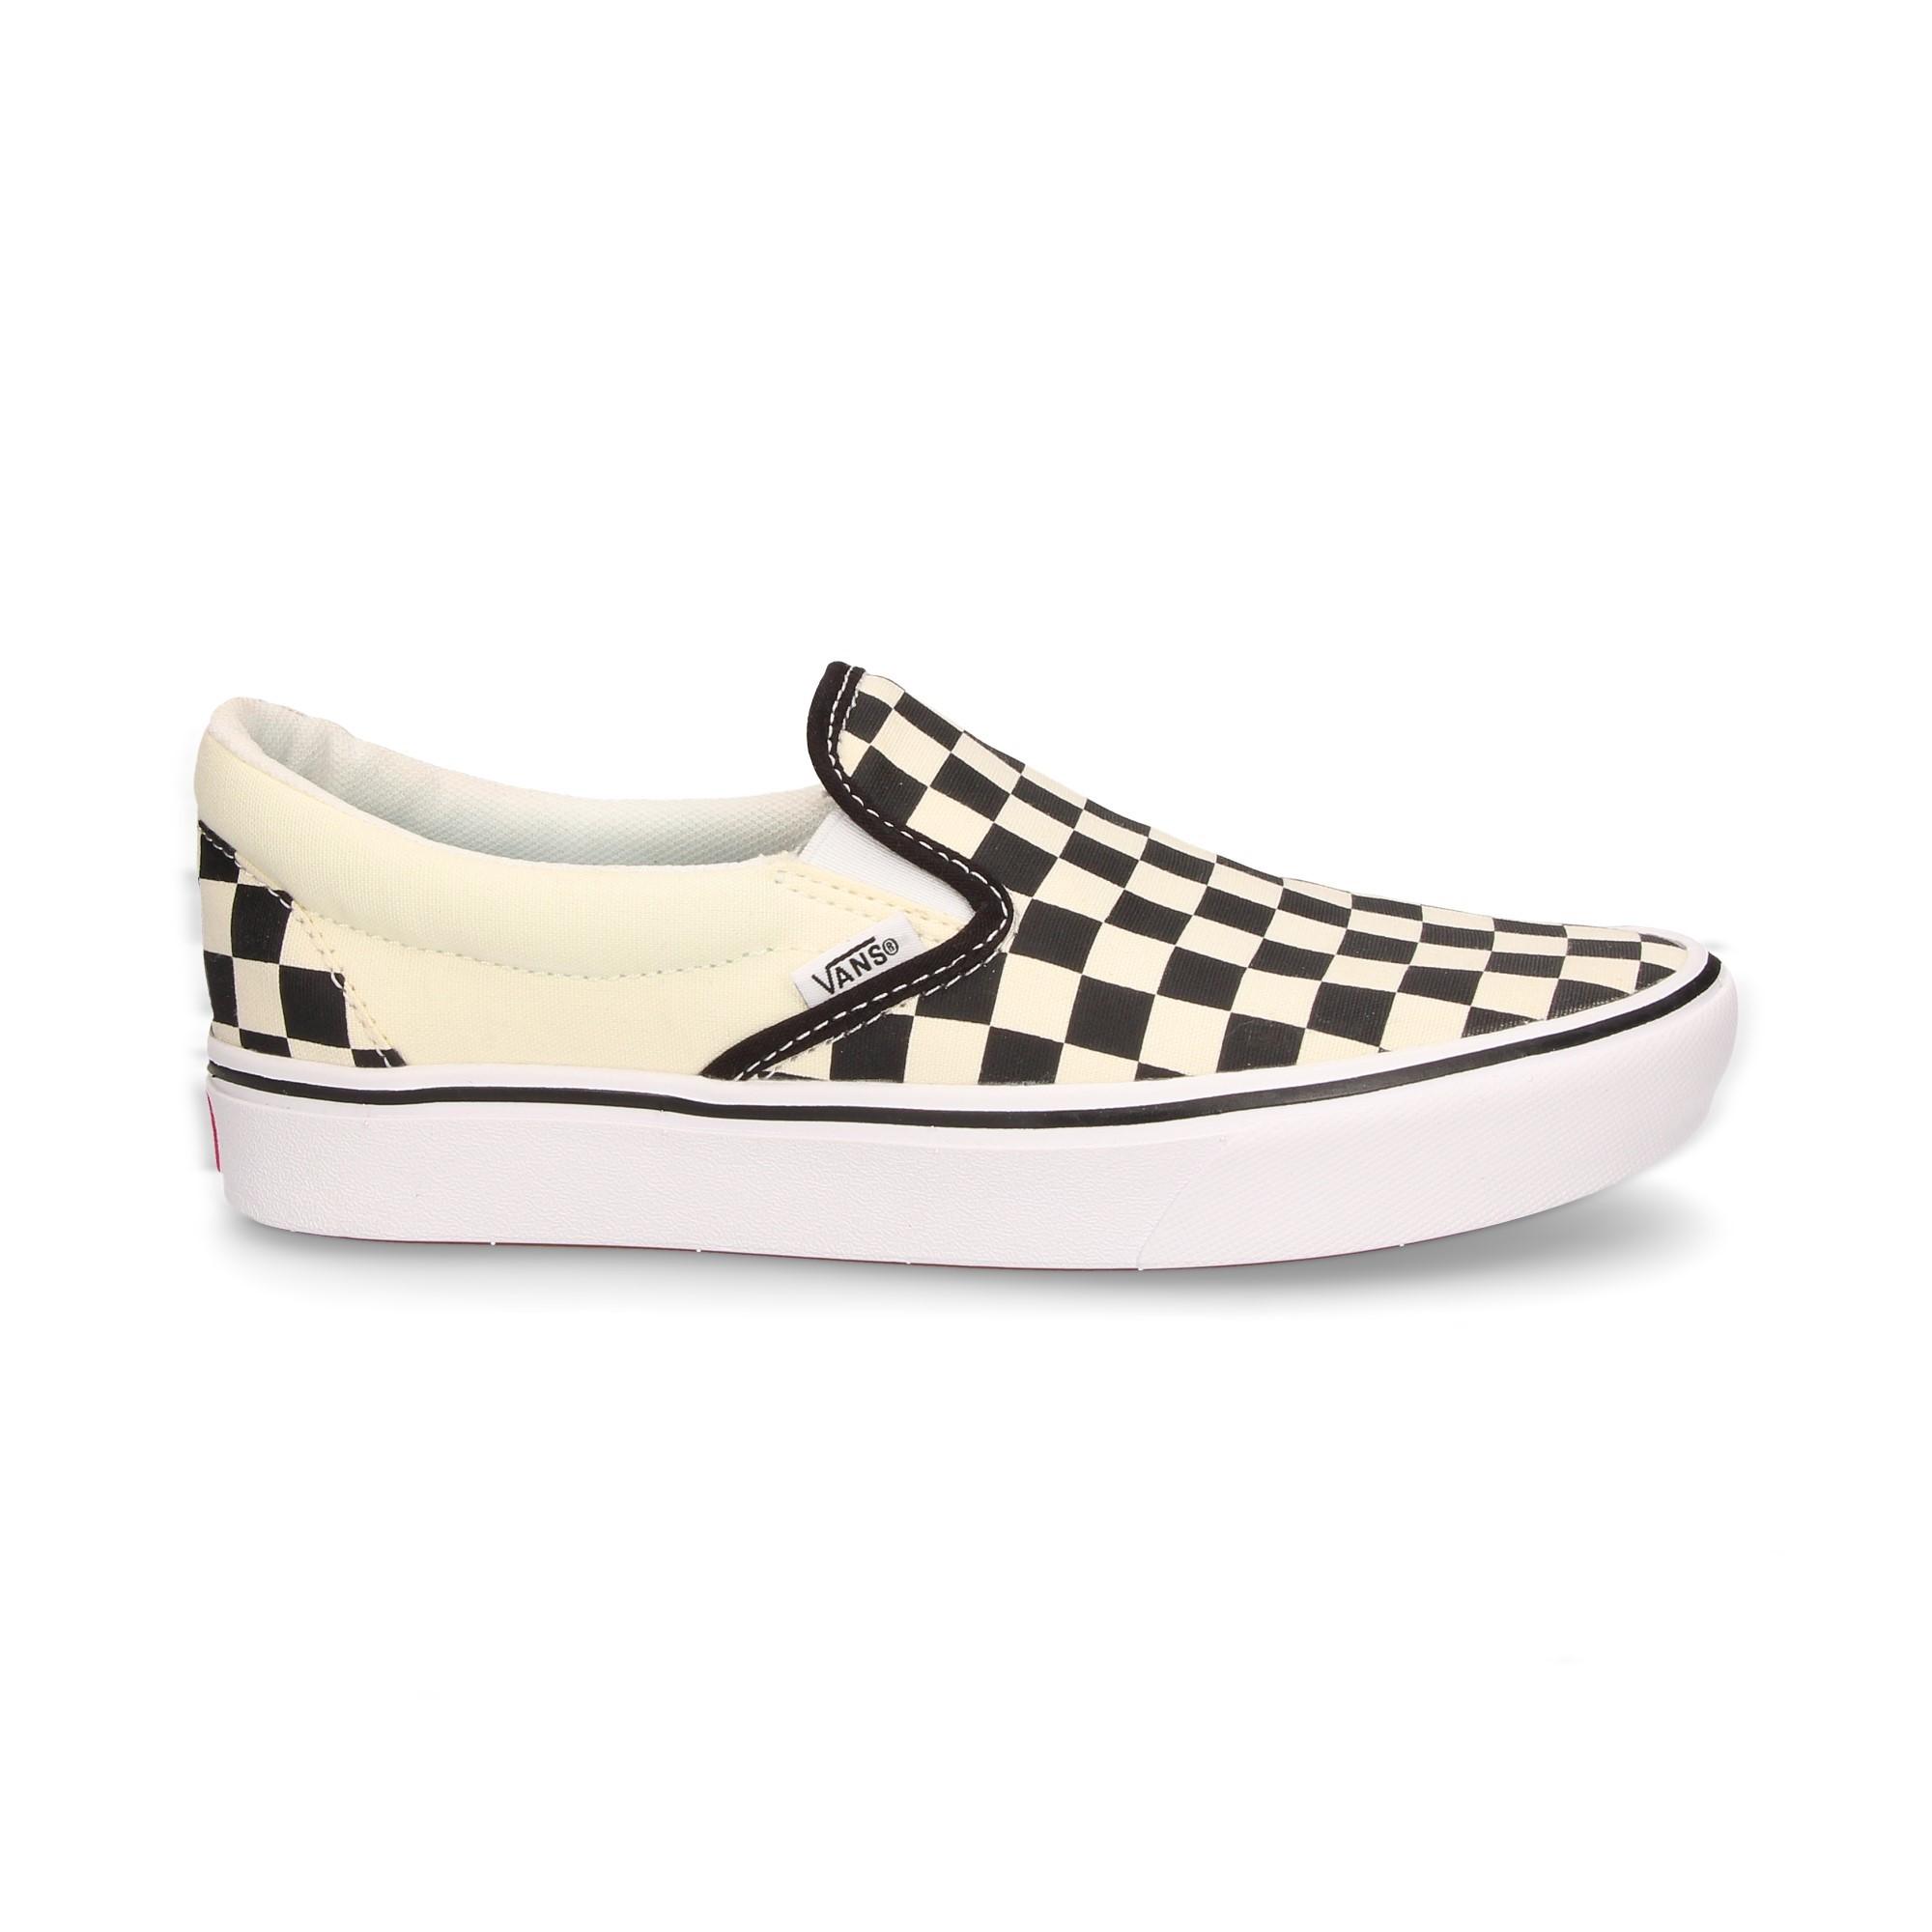 chaussure vans a caro